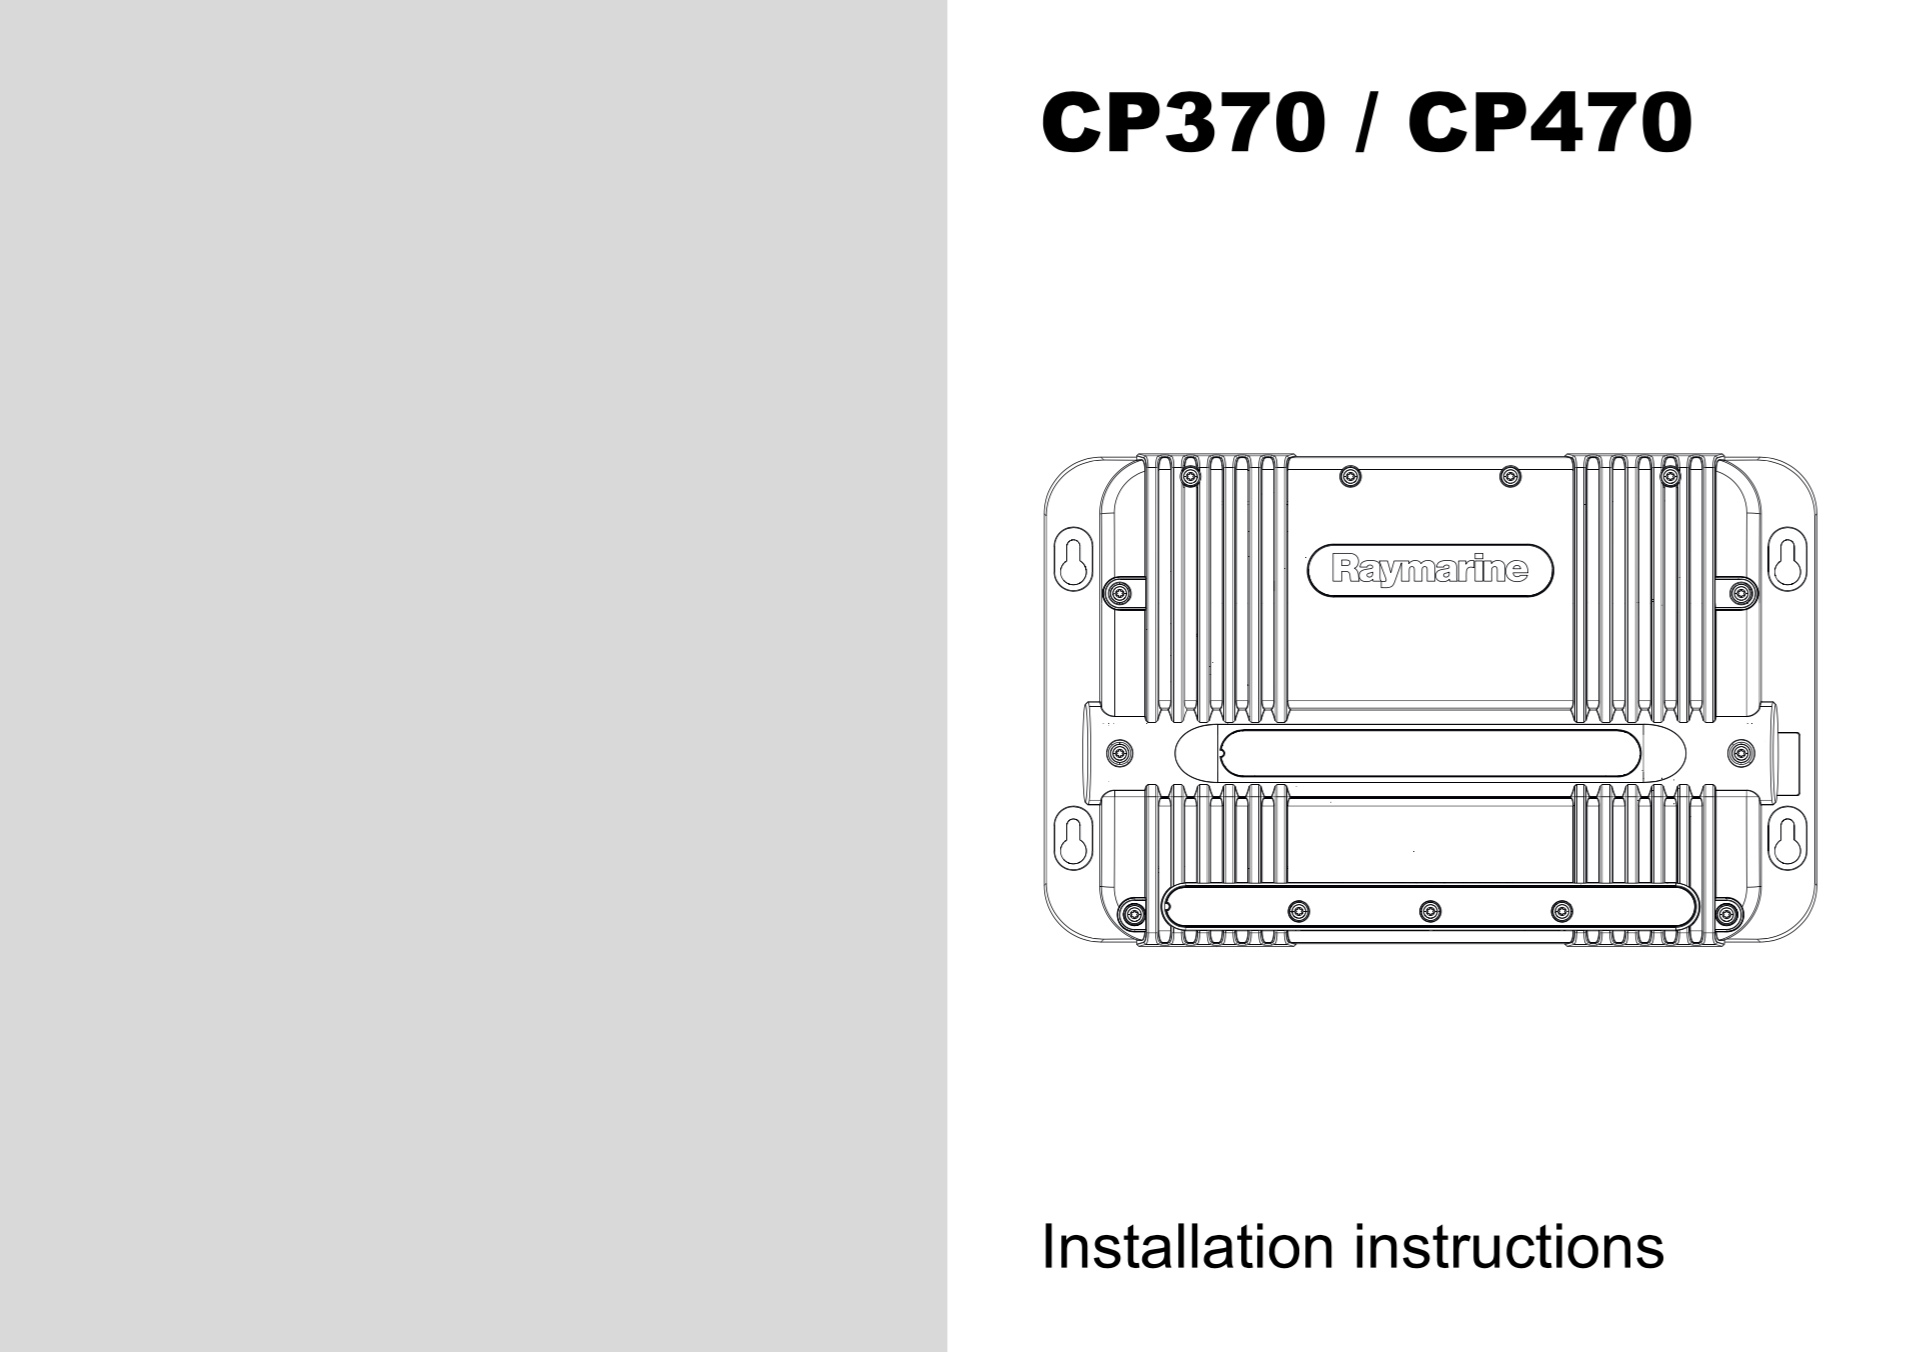 cp370 cp470 installation instructions sonar